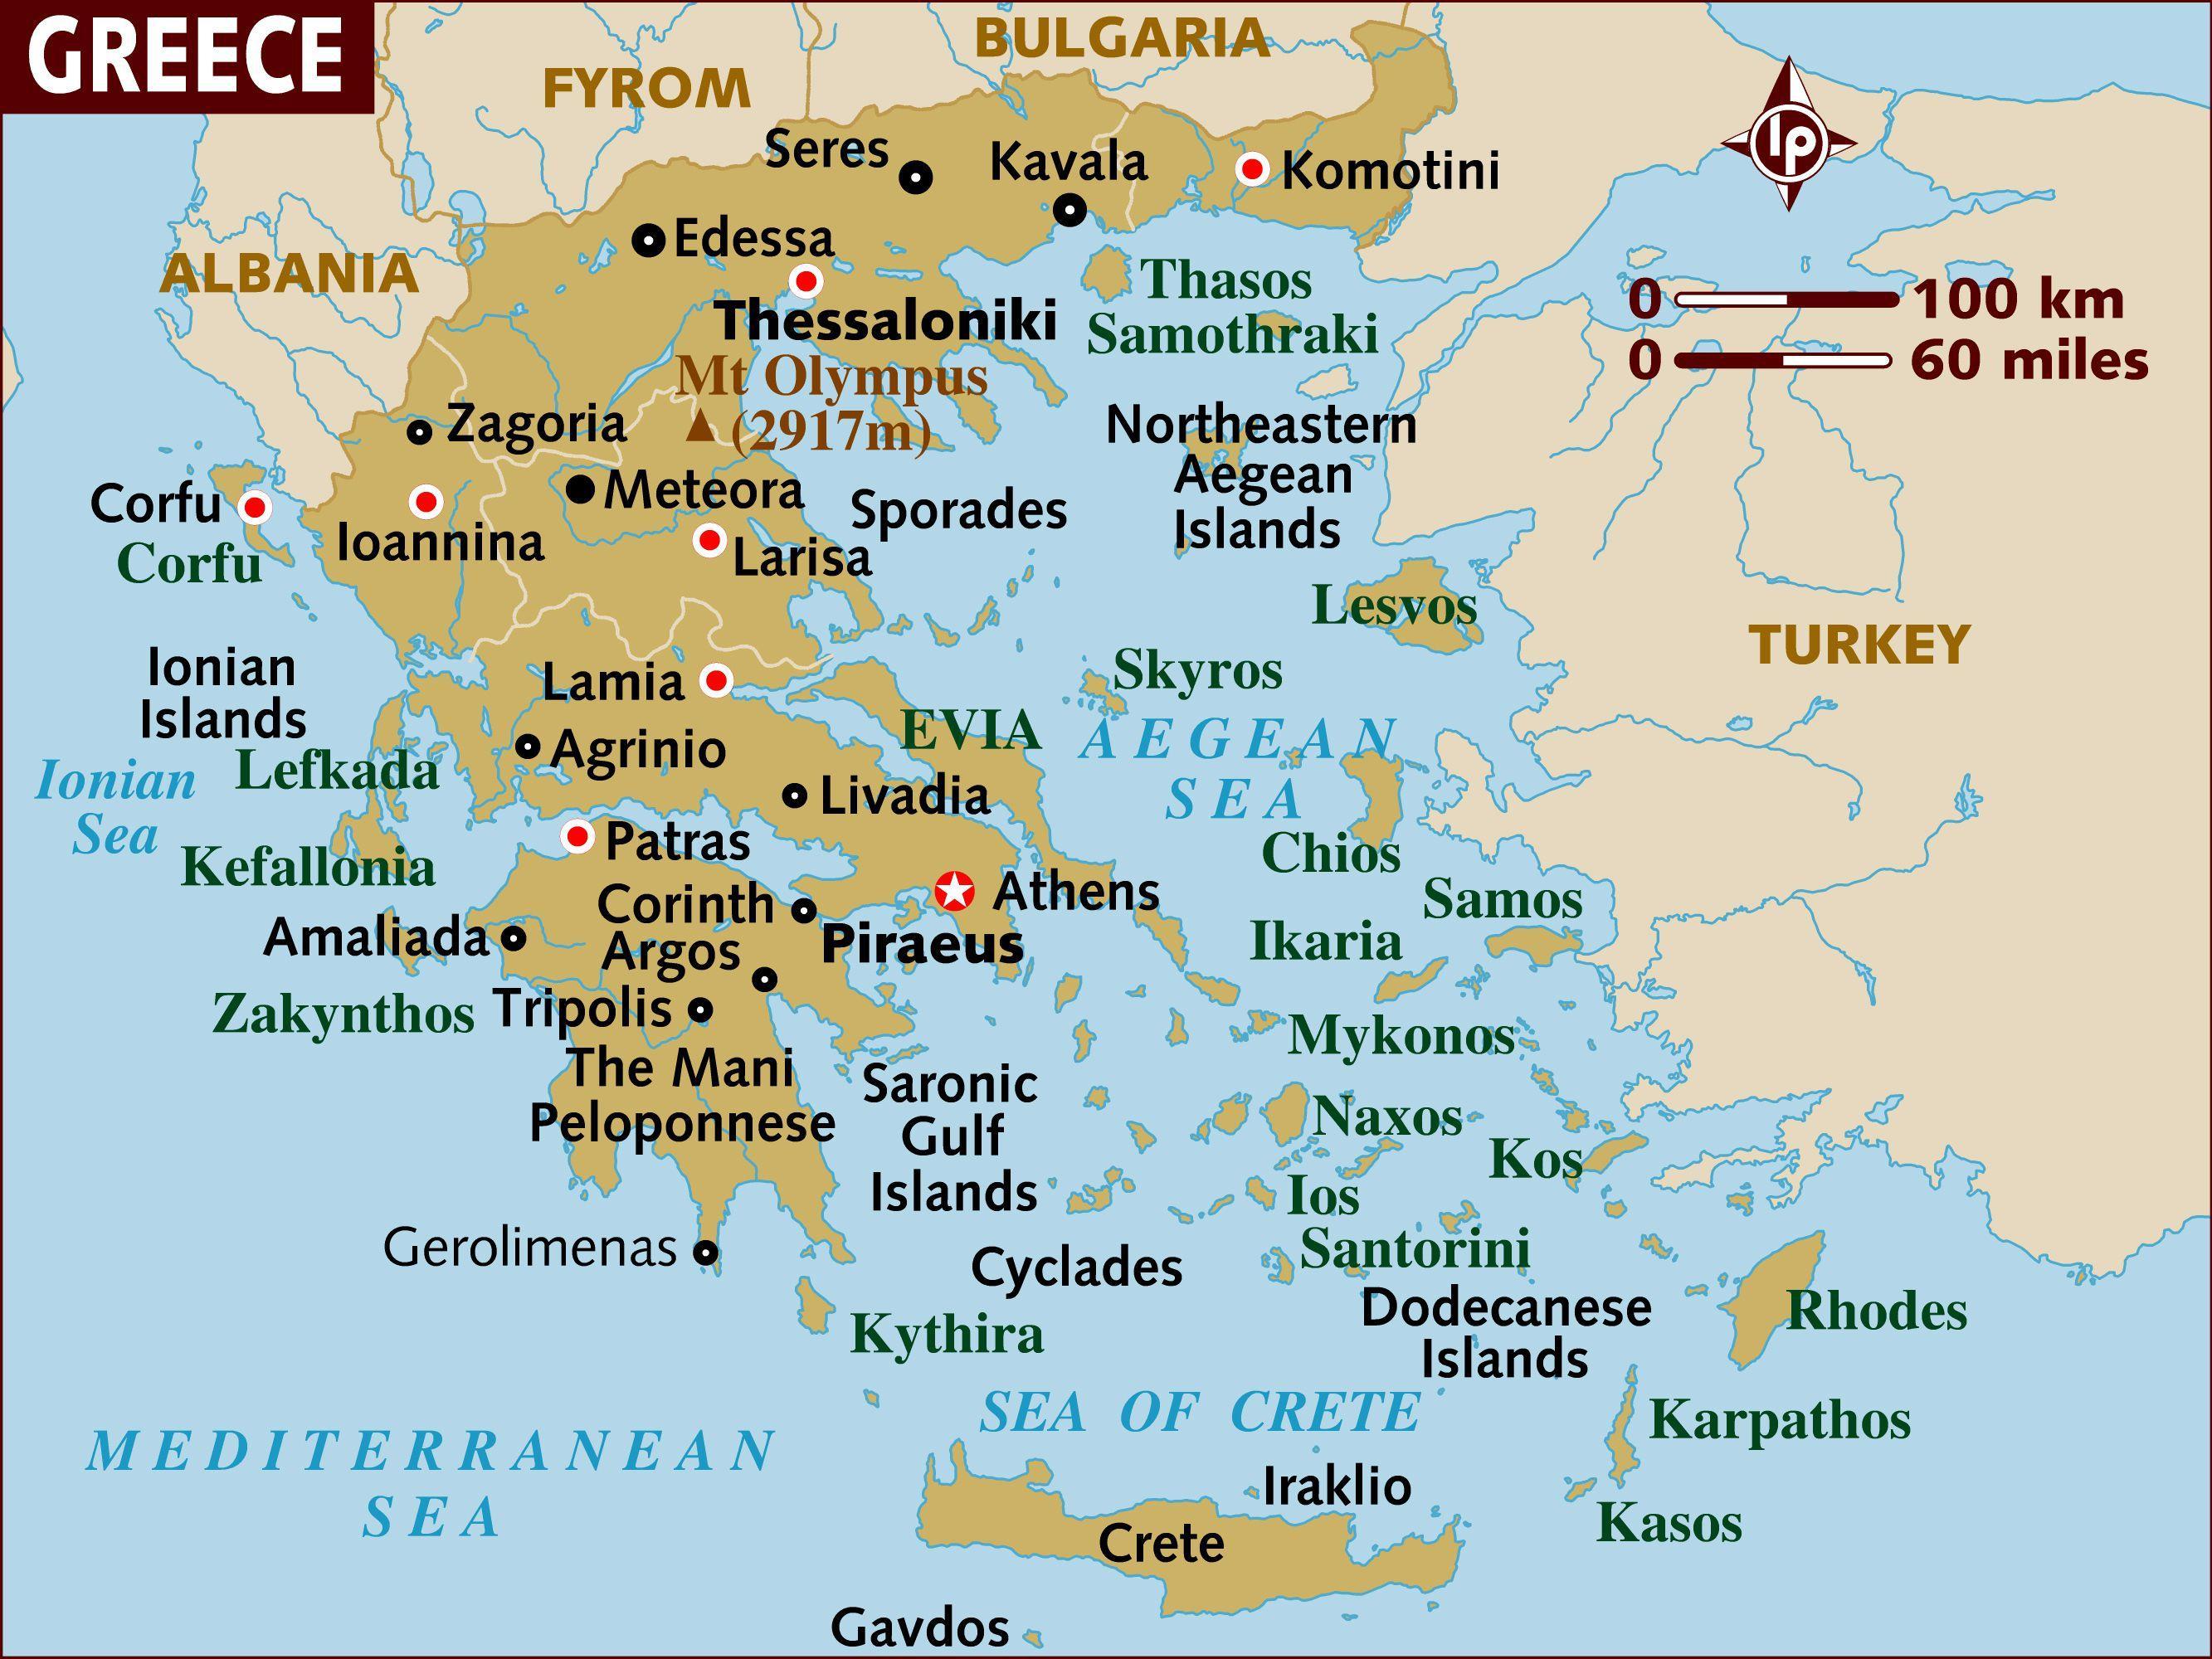 Preferência Mapa da Grécia ilhas - Mapa de ilhas gregas (Sul da Europa - Europa) LZ29